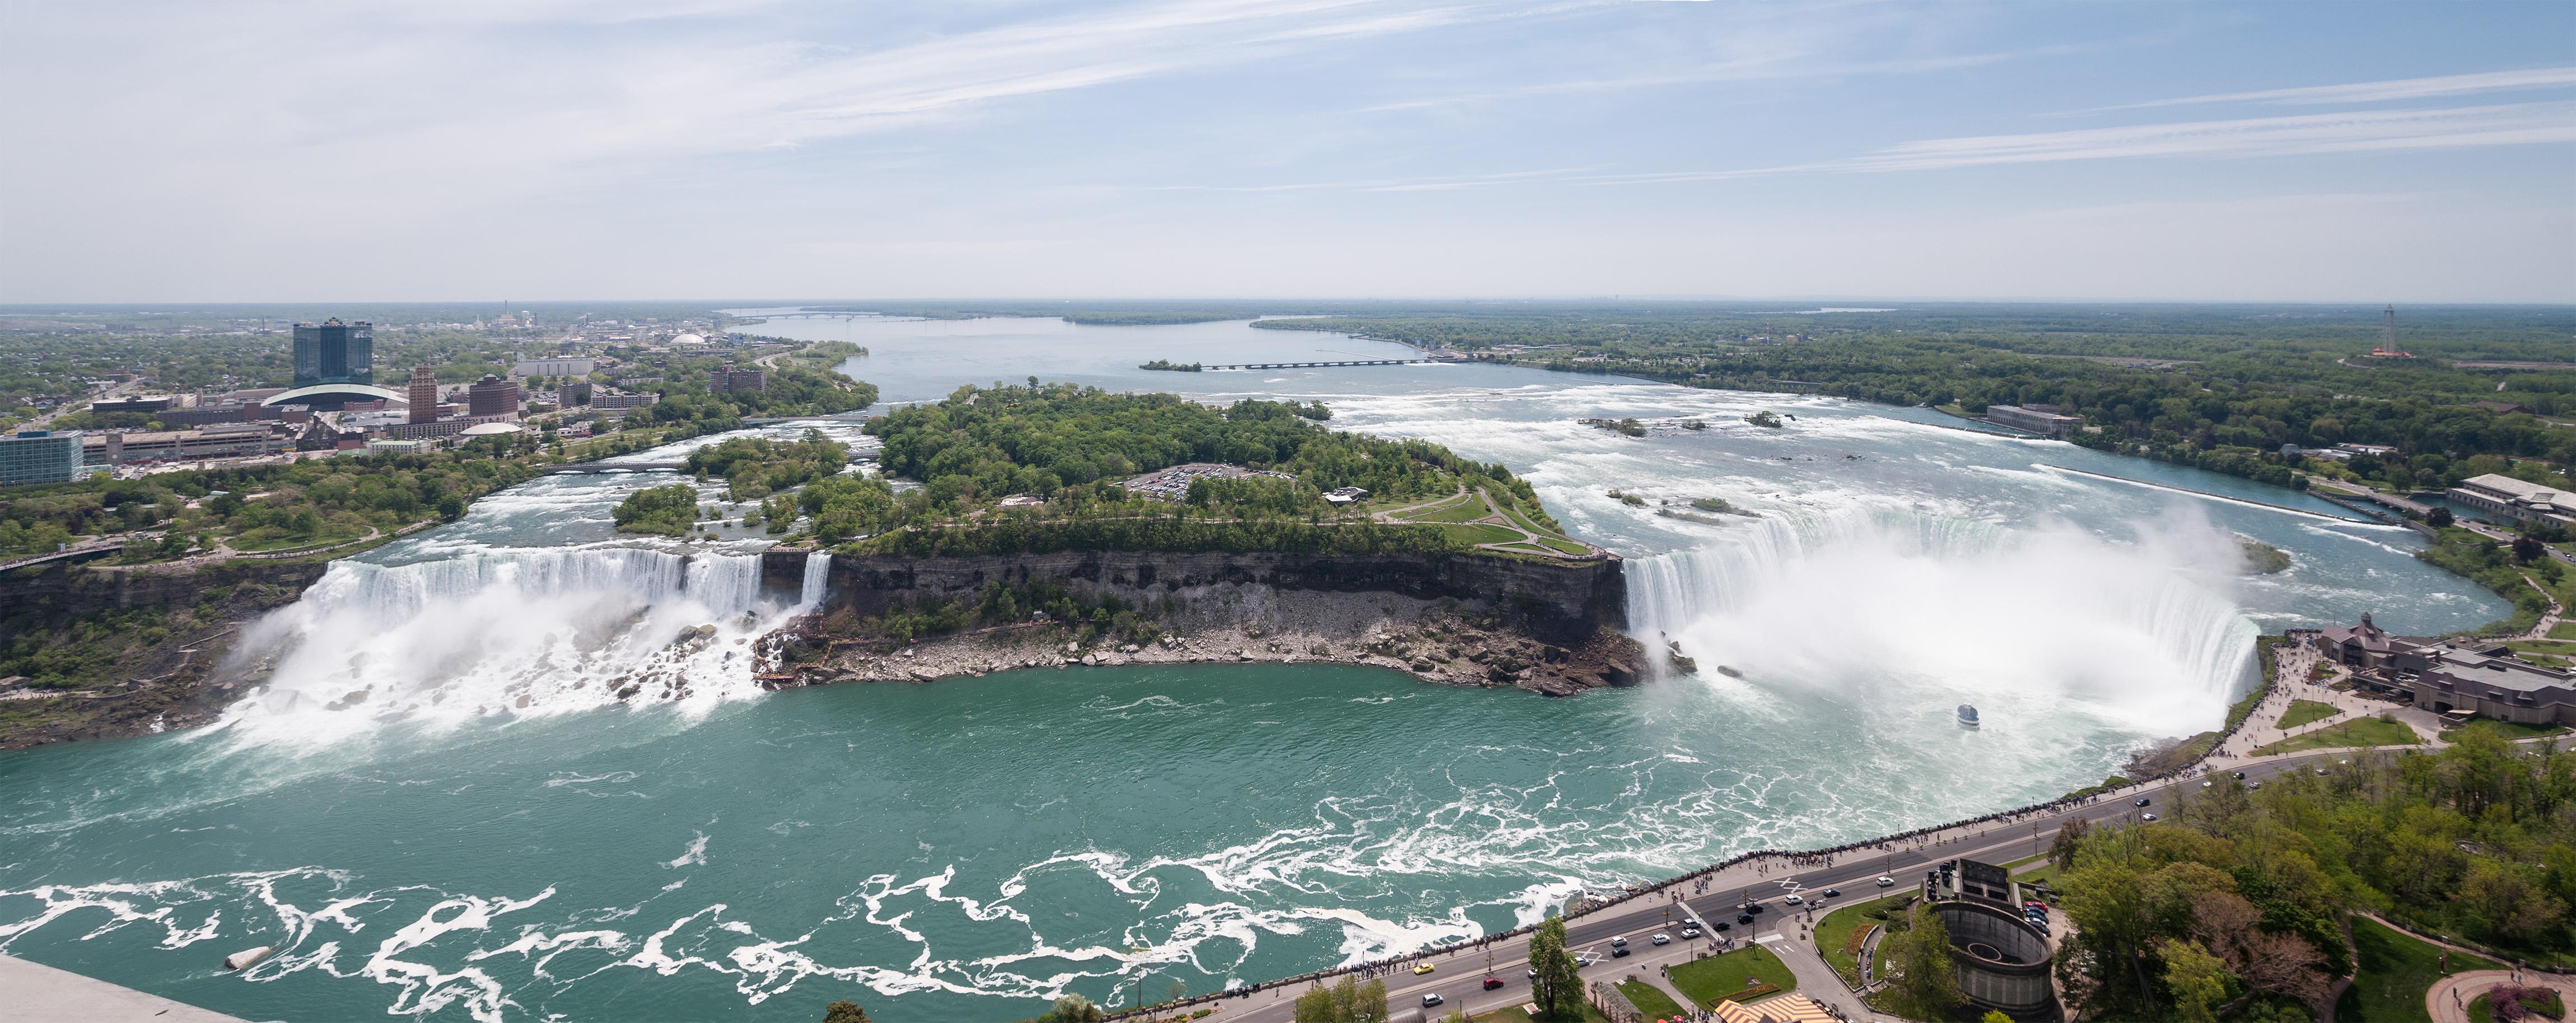 Lauderdale Niagara Falls Dating In Kinky